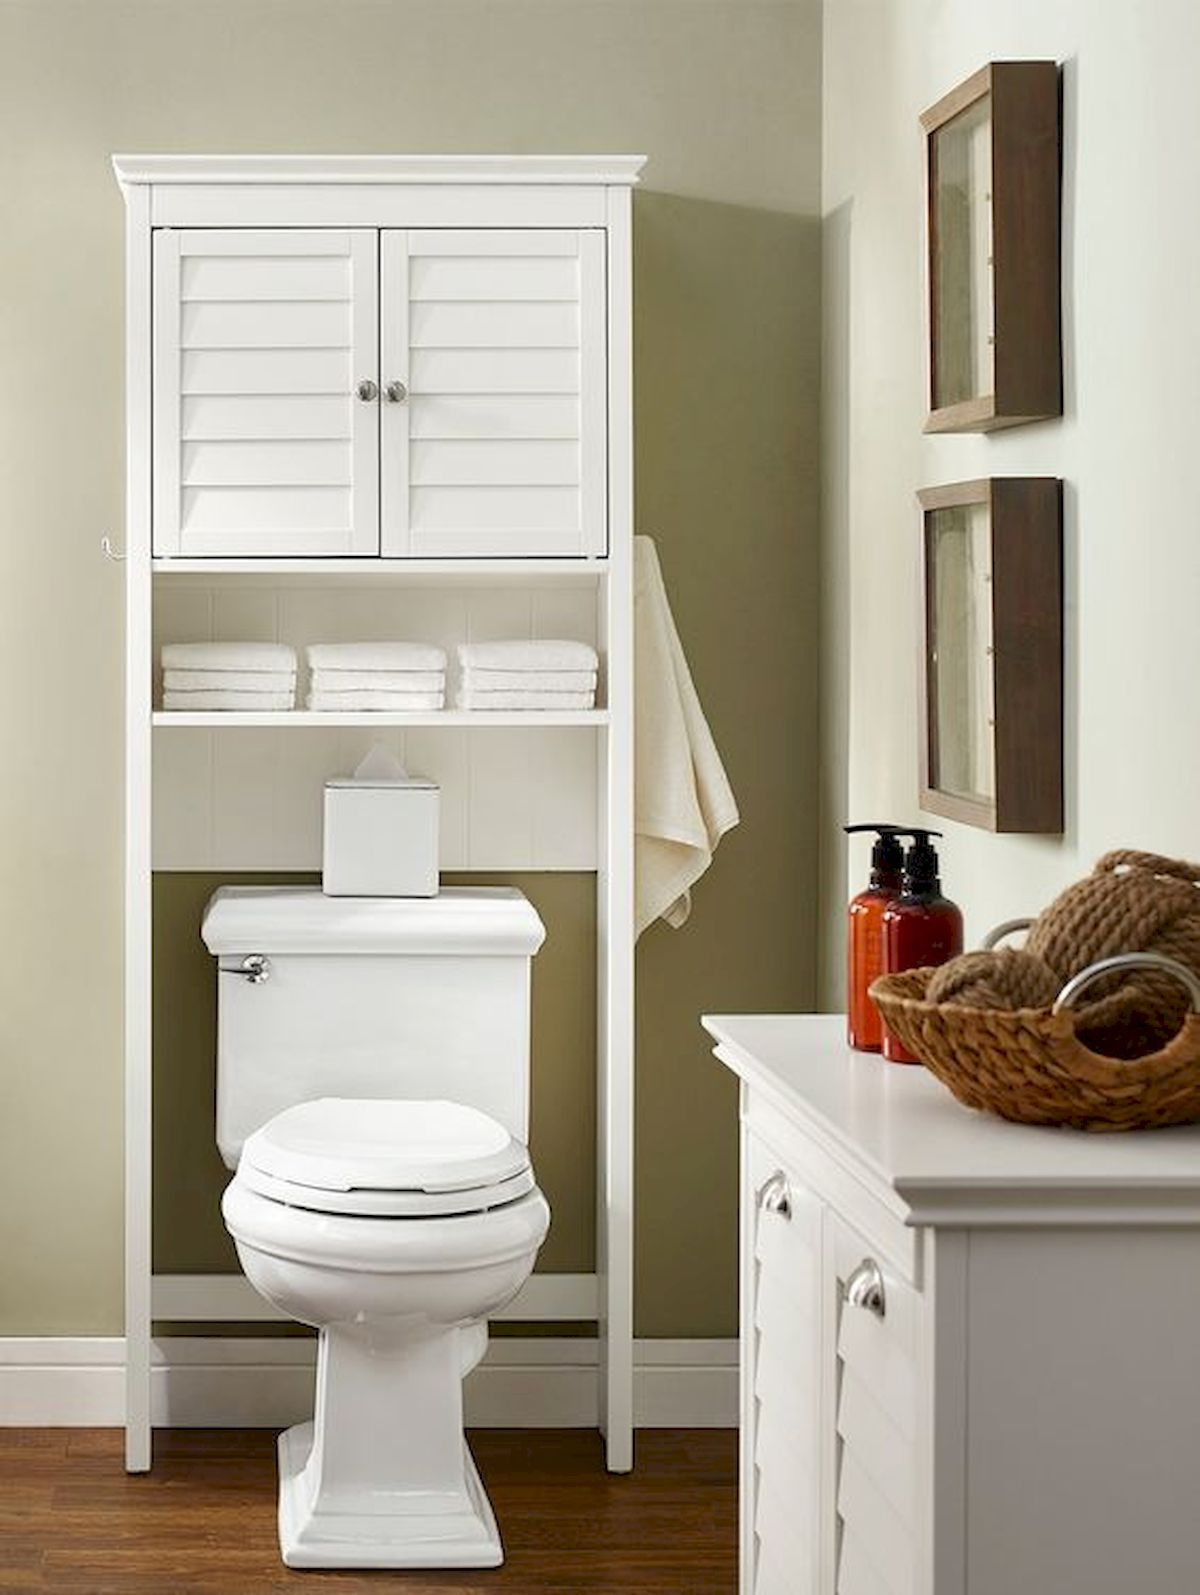 33 Fantastic Bathroom Storage Decor Ideas And Remodel 33 Bathroom in measurements 1200 X 1595